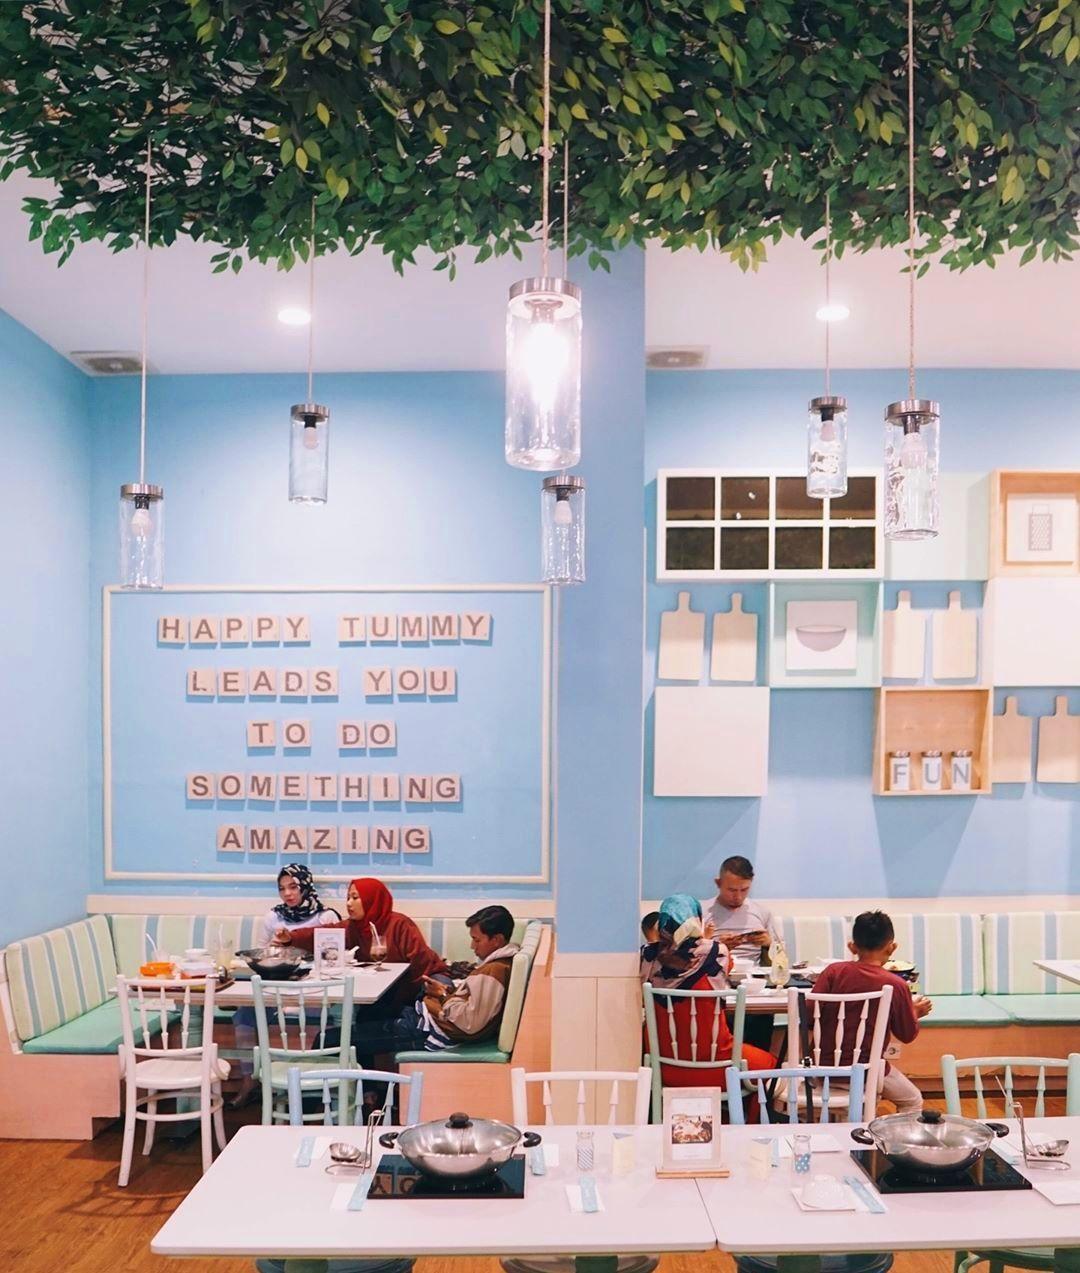 8 Rekomendasi Kafe Hits di Bandung Yang Wajib Dikunjungi